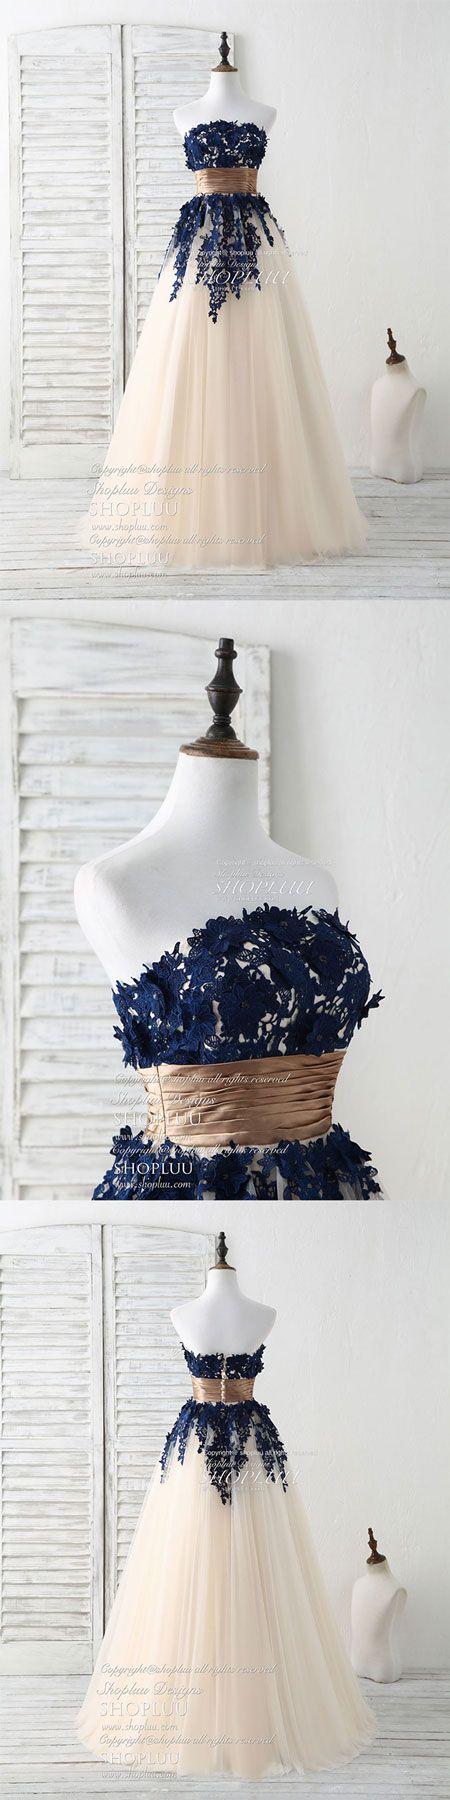 Dark blue lace applique tulle long prom dress blue bridesmaid dress, blue wedding party dress